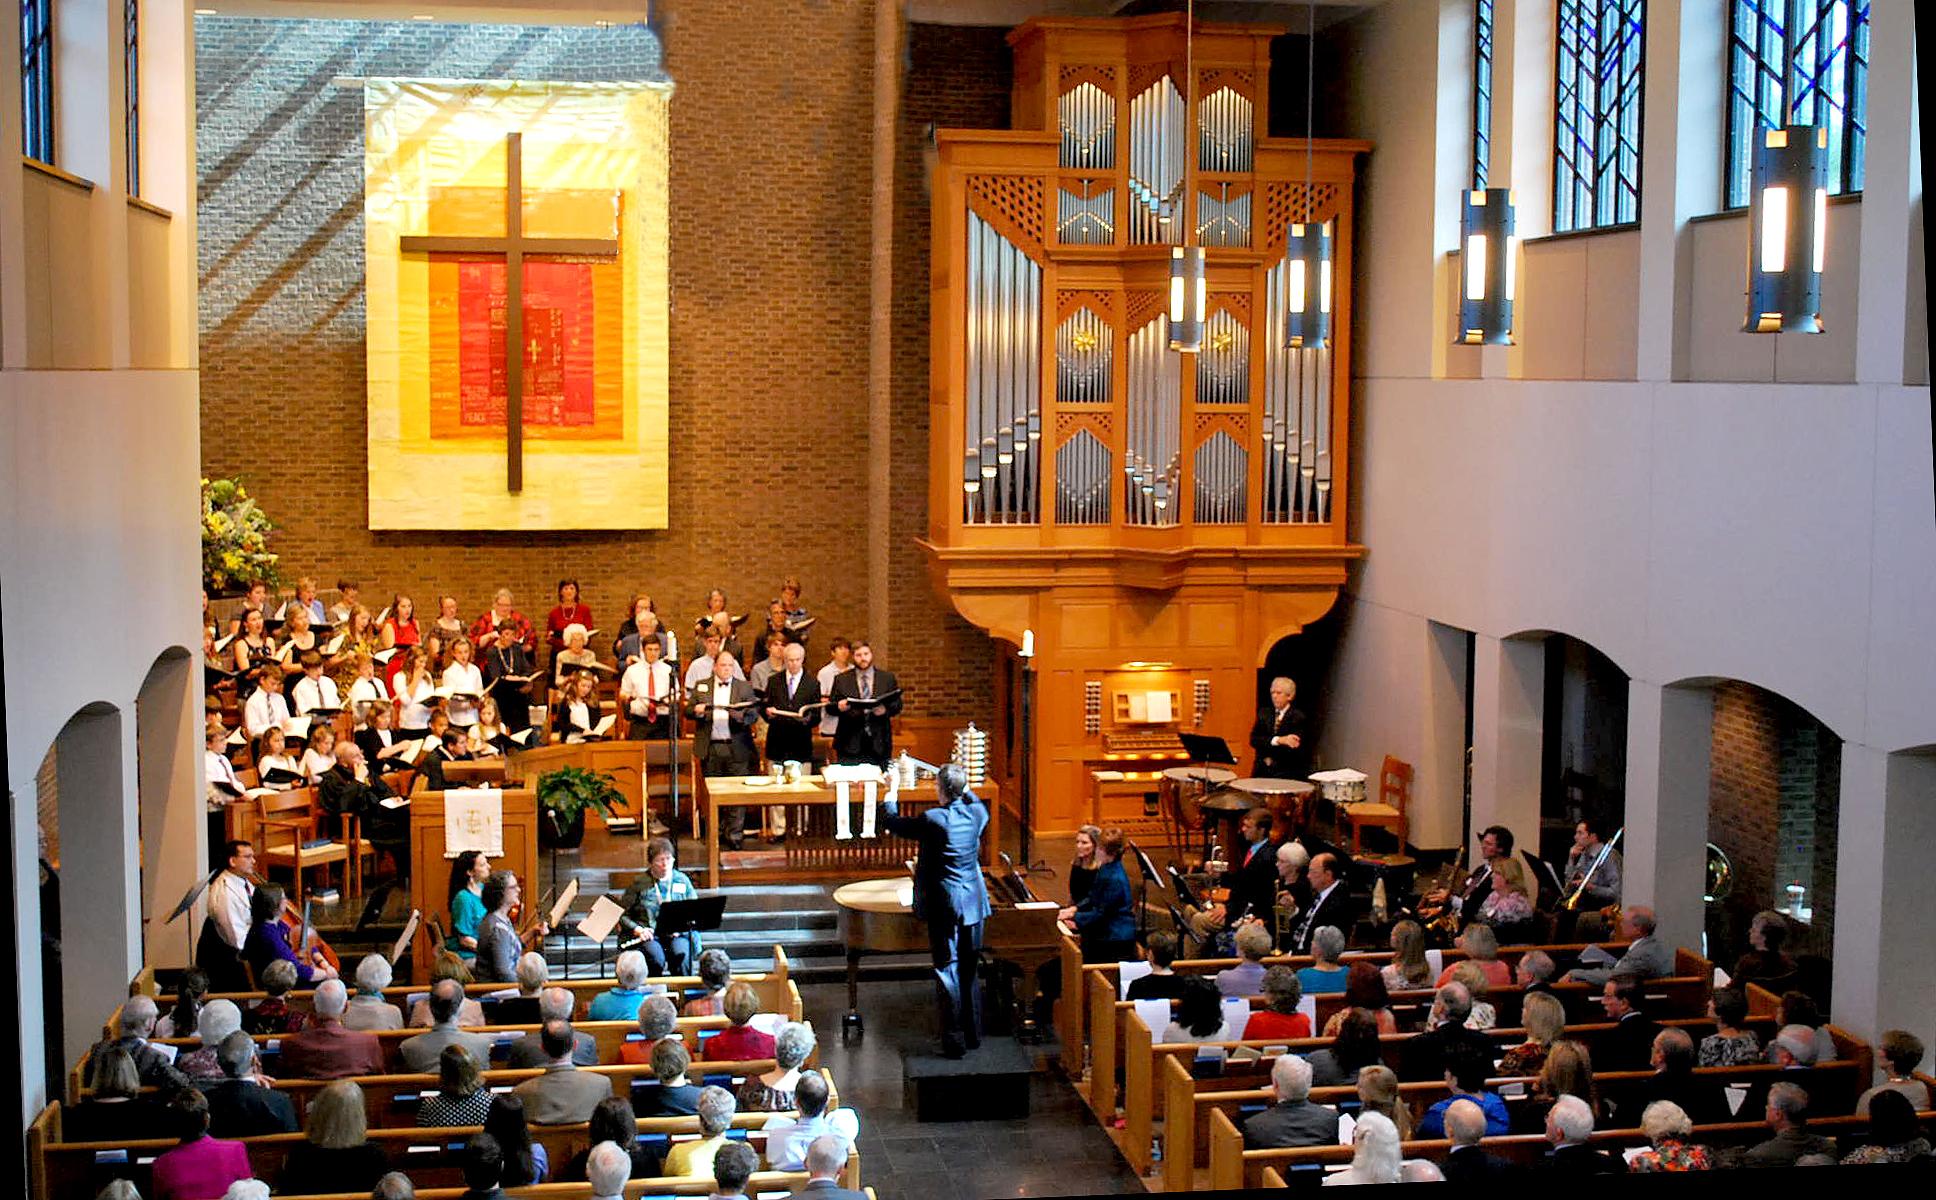 Music & Choirs - Westminster Presbyterian Church